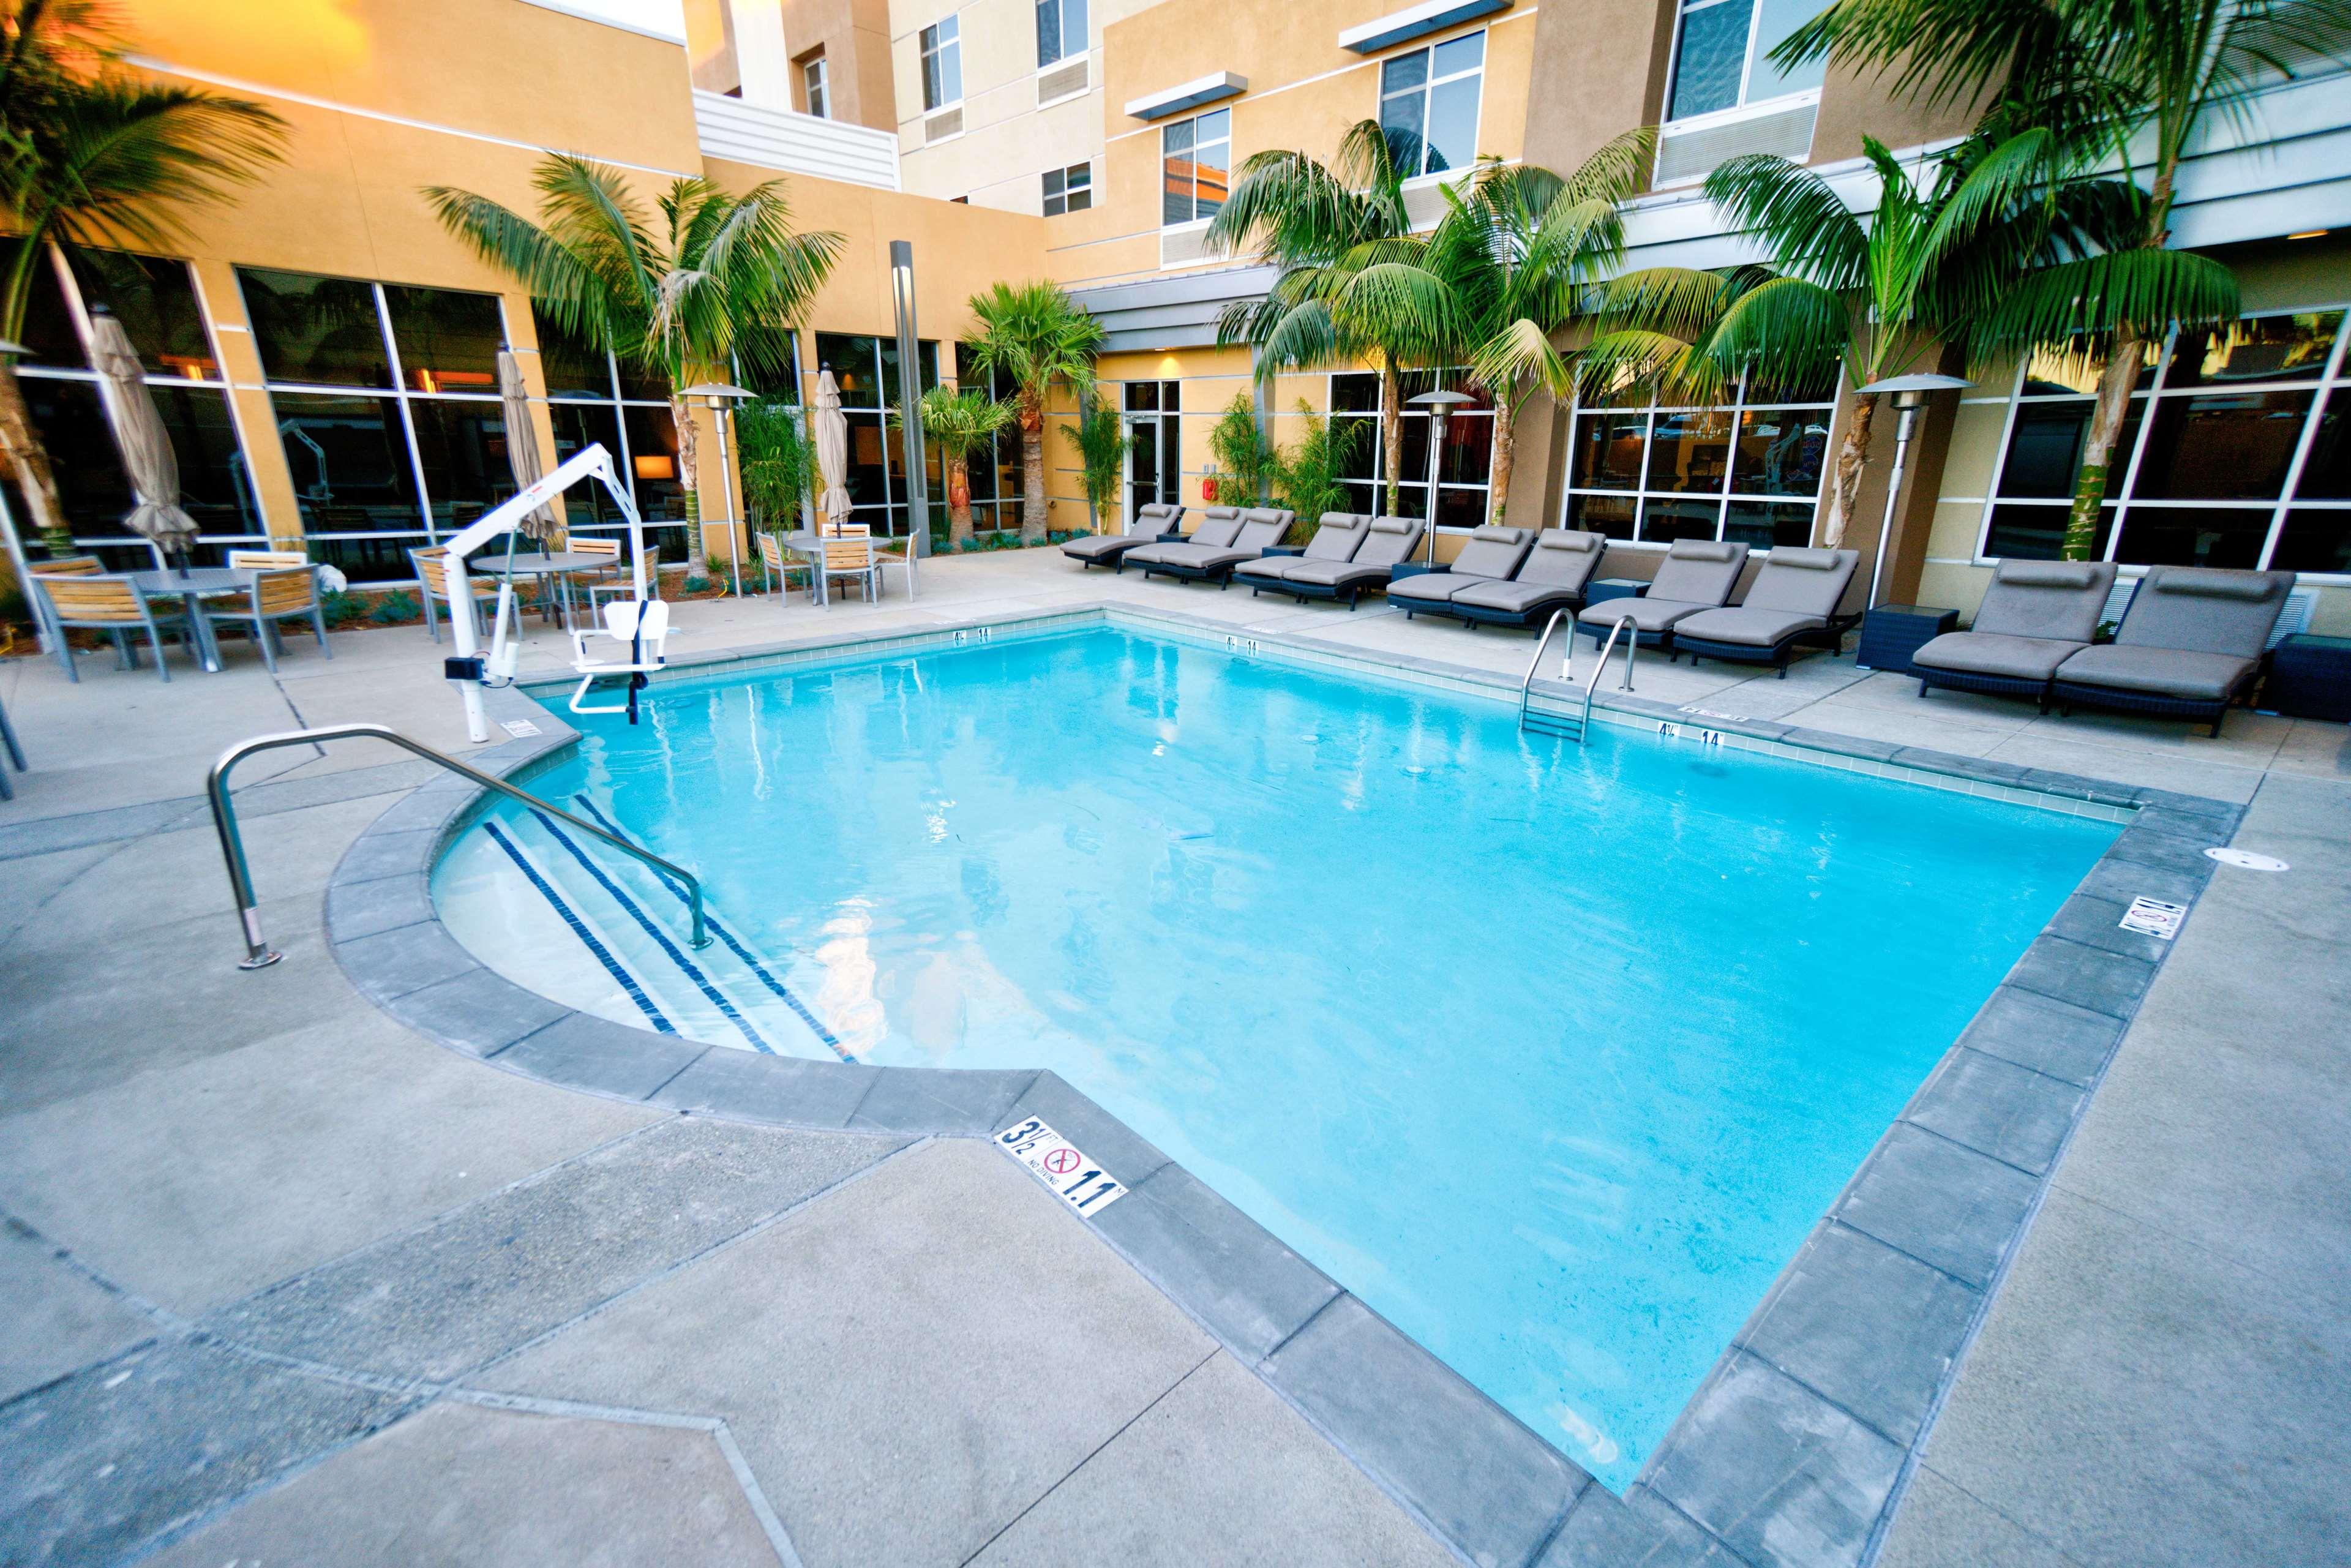 Hilton Garden Inn Santa Barbara/Goleta image 17